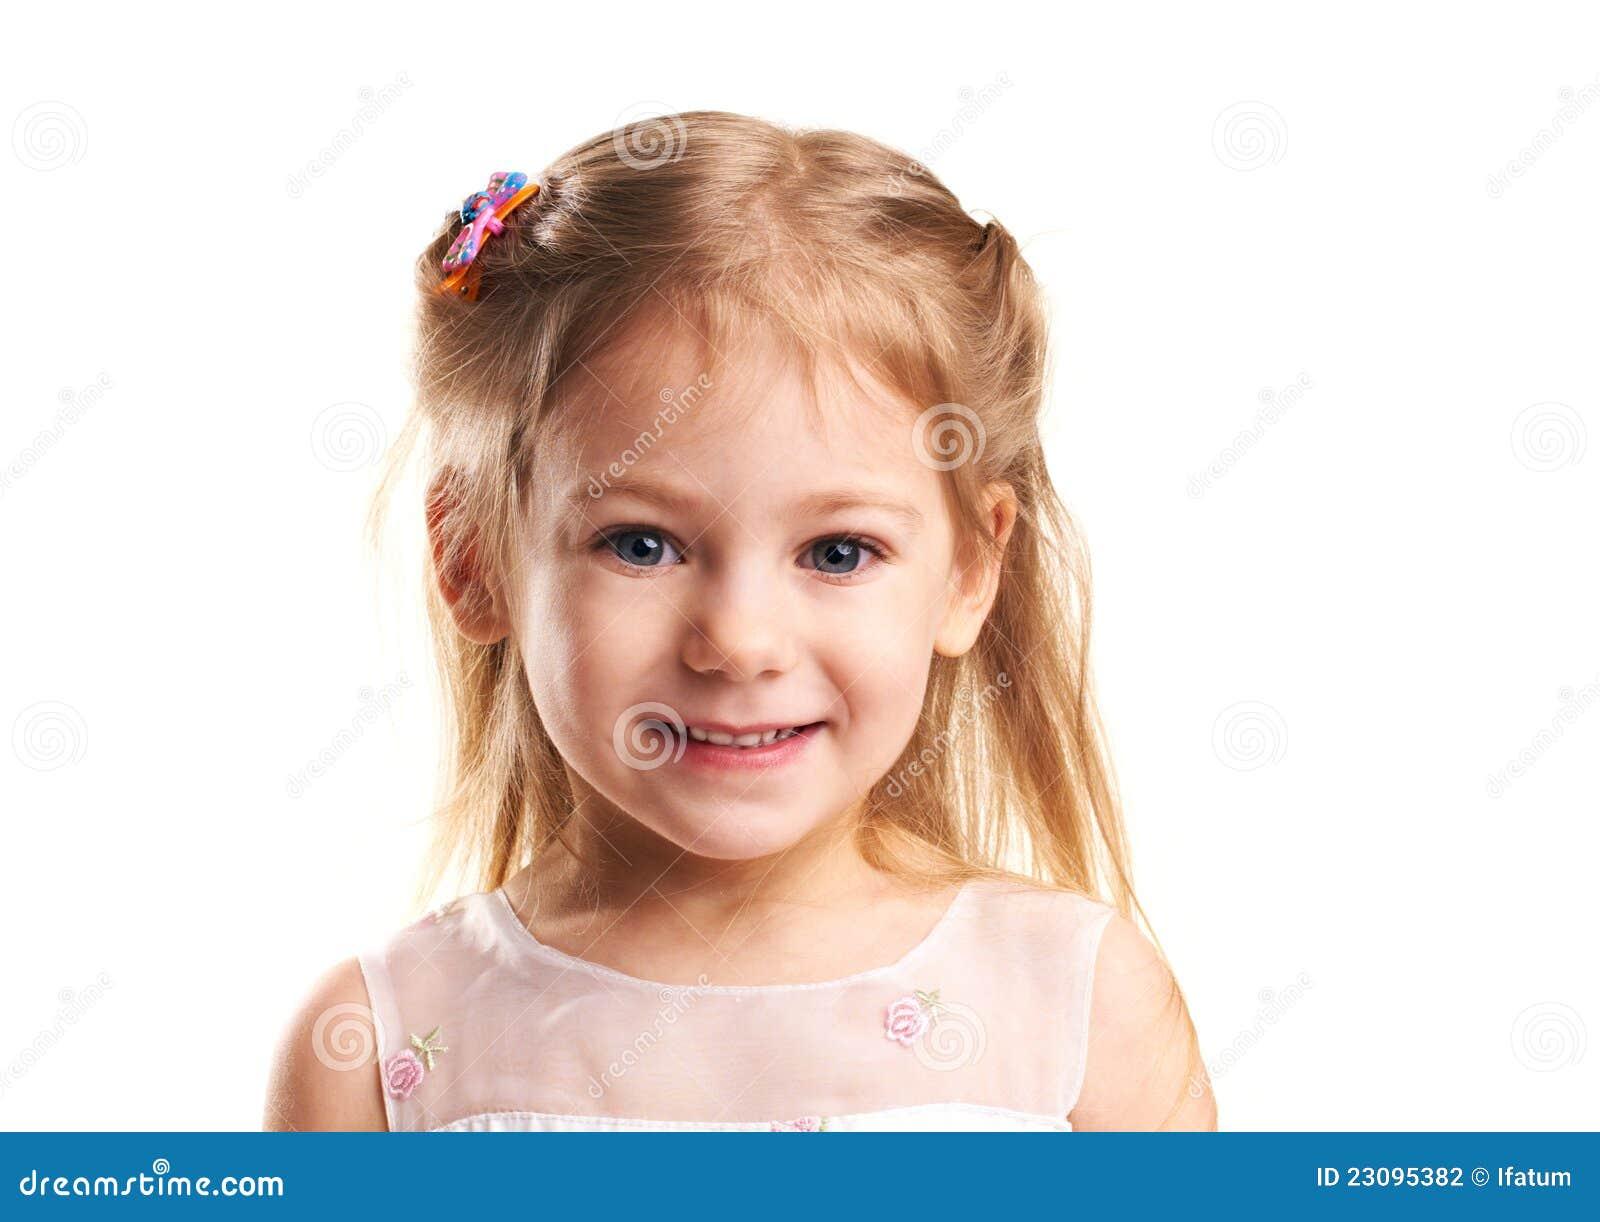 little girl smiles stock photography image 23095382